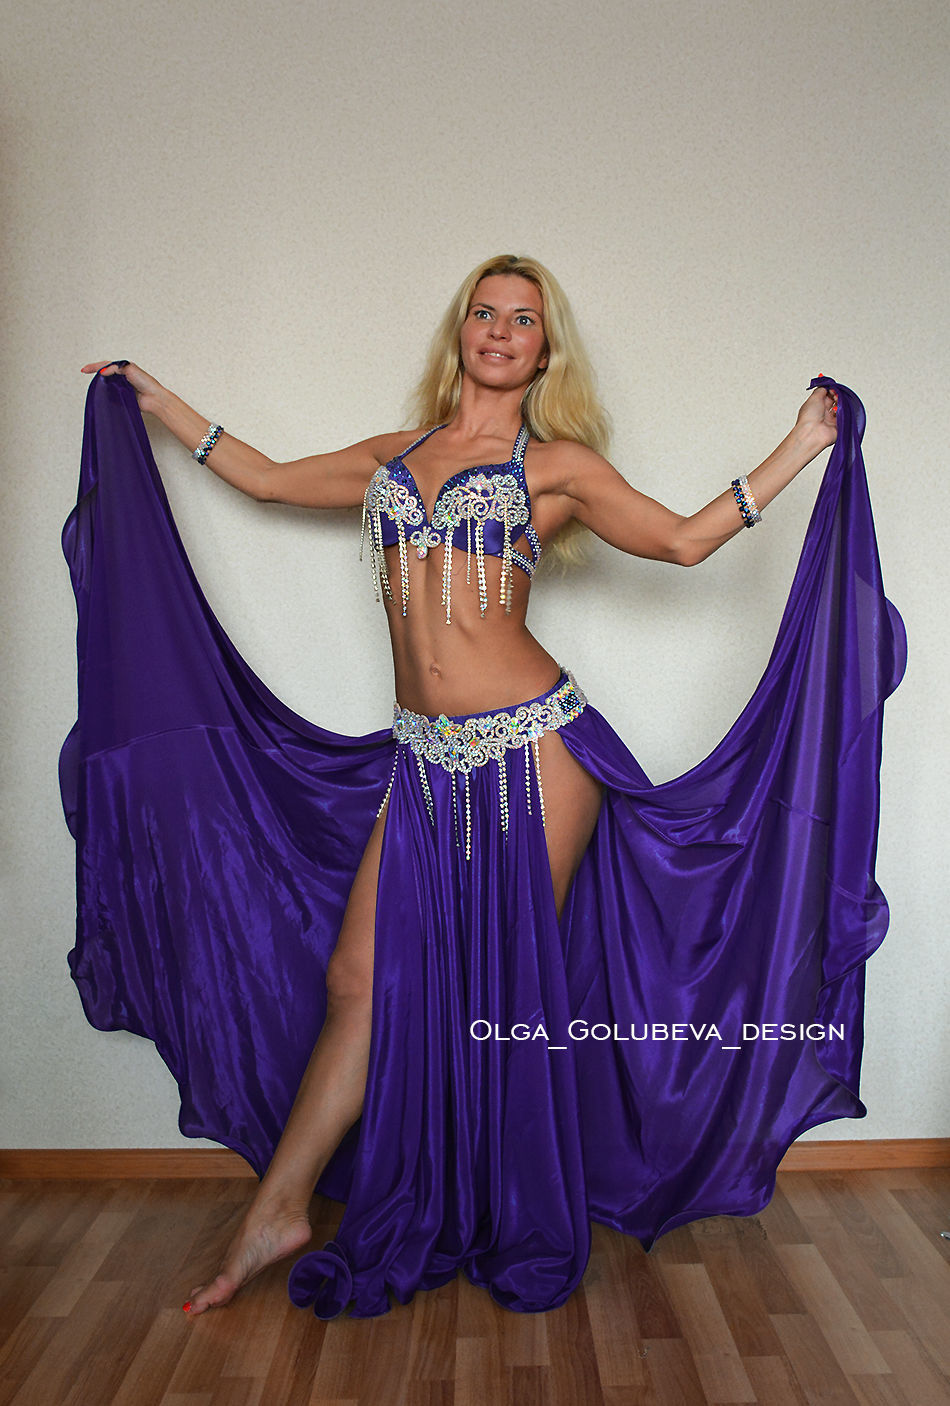 "Костюм для танца живота ""Purple Queen"", Костюмы, Санкт-Петербург,  Фото №1"